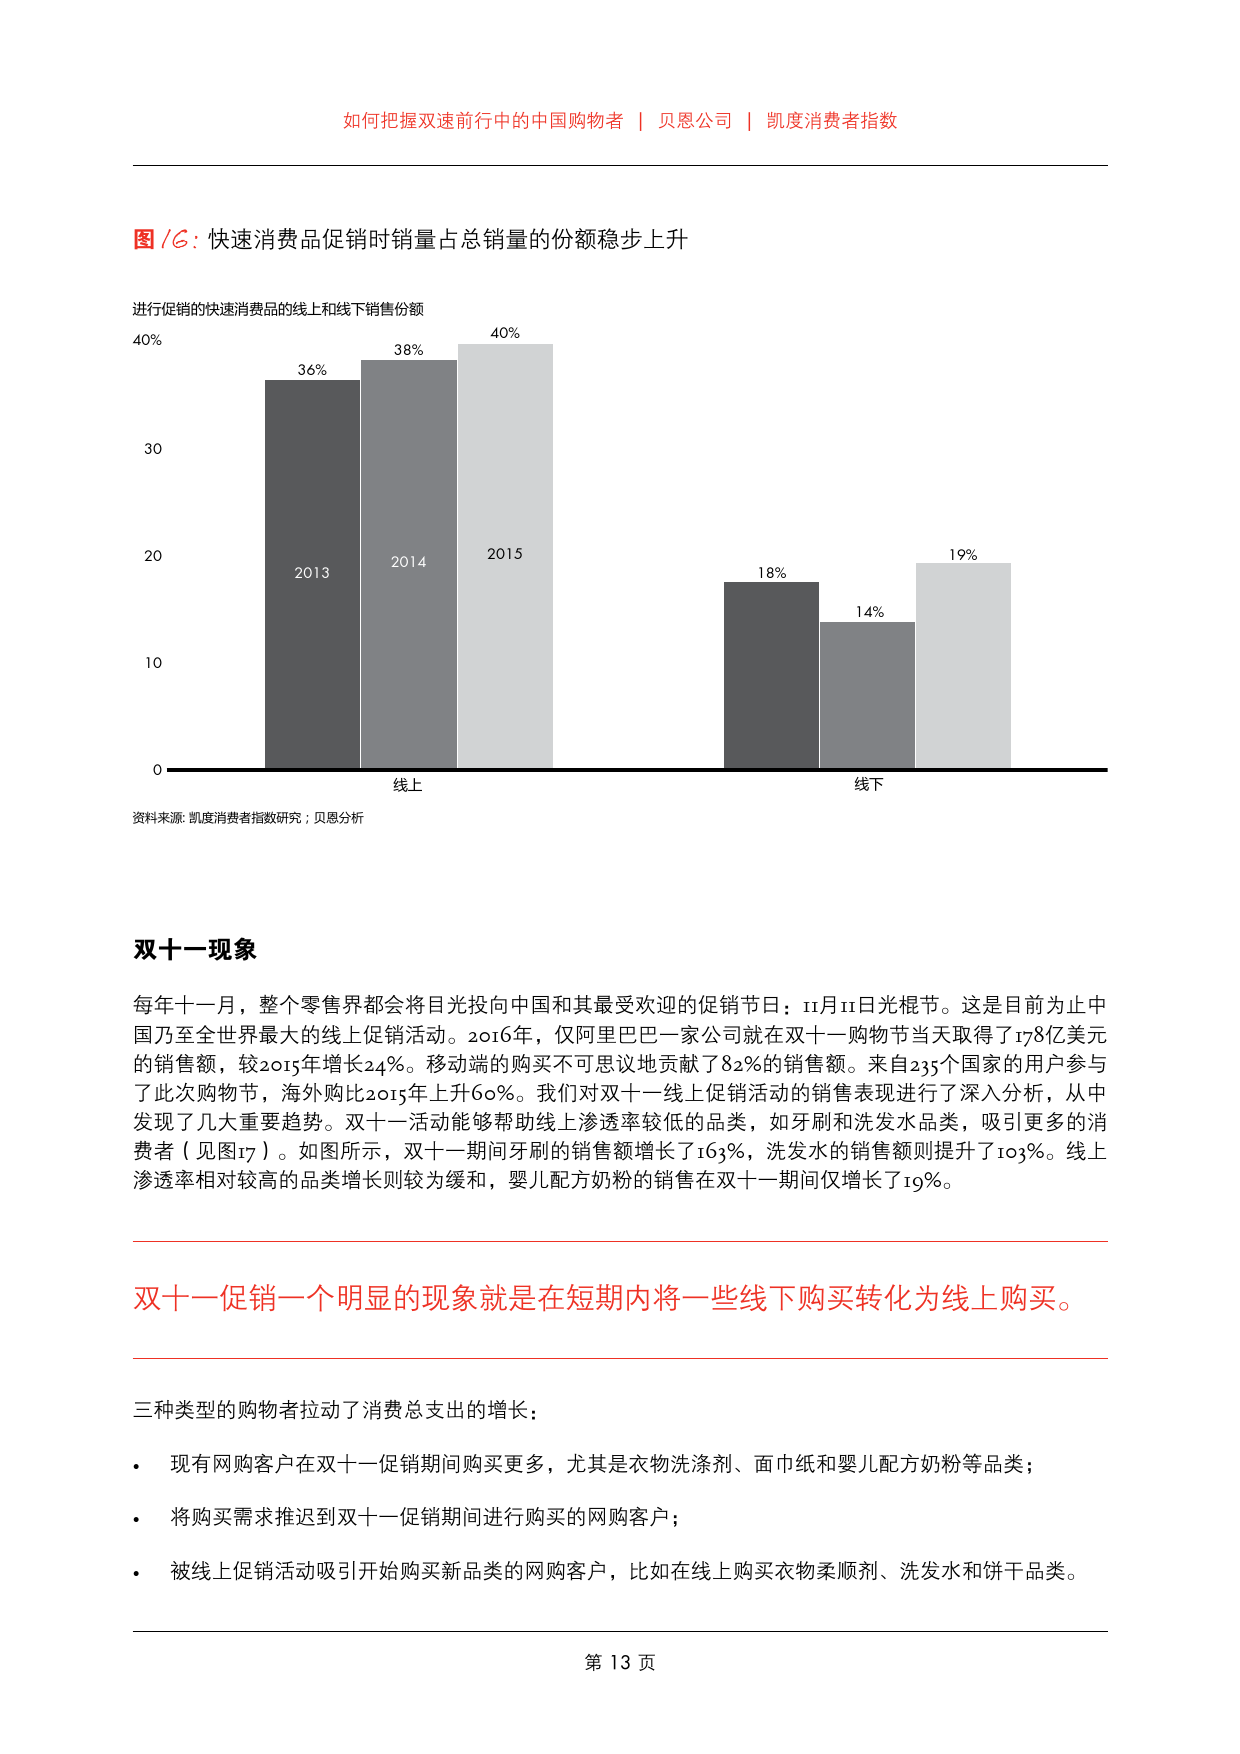 2016%e5%b9%b4%e4%b8%ad%e5%9b%bd%e8%b4%ad%e7%89%a9%e8%80%85%e6%8a%a5%e5%91%8a2_000017